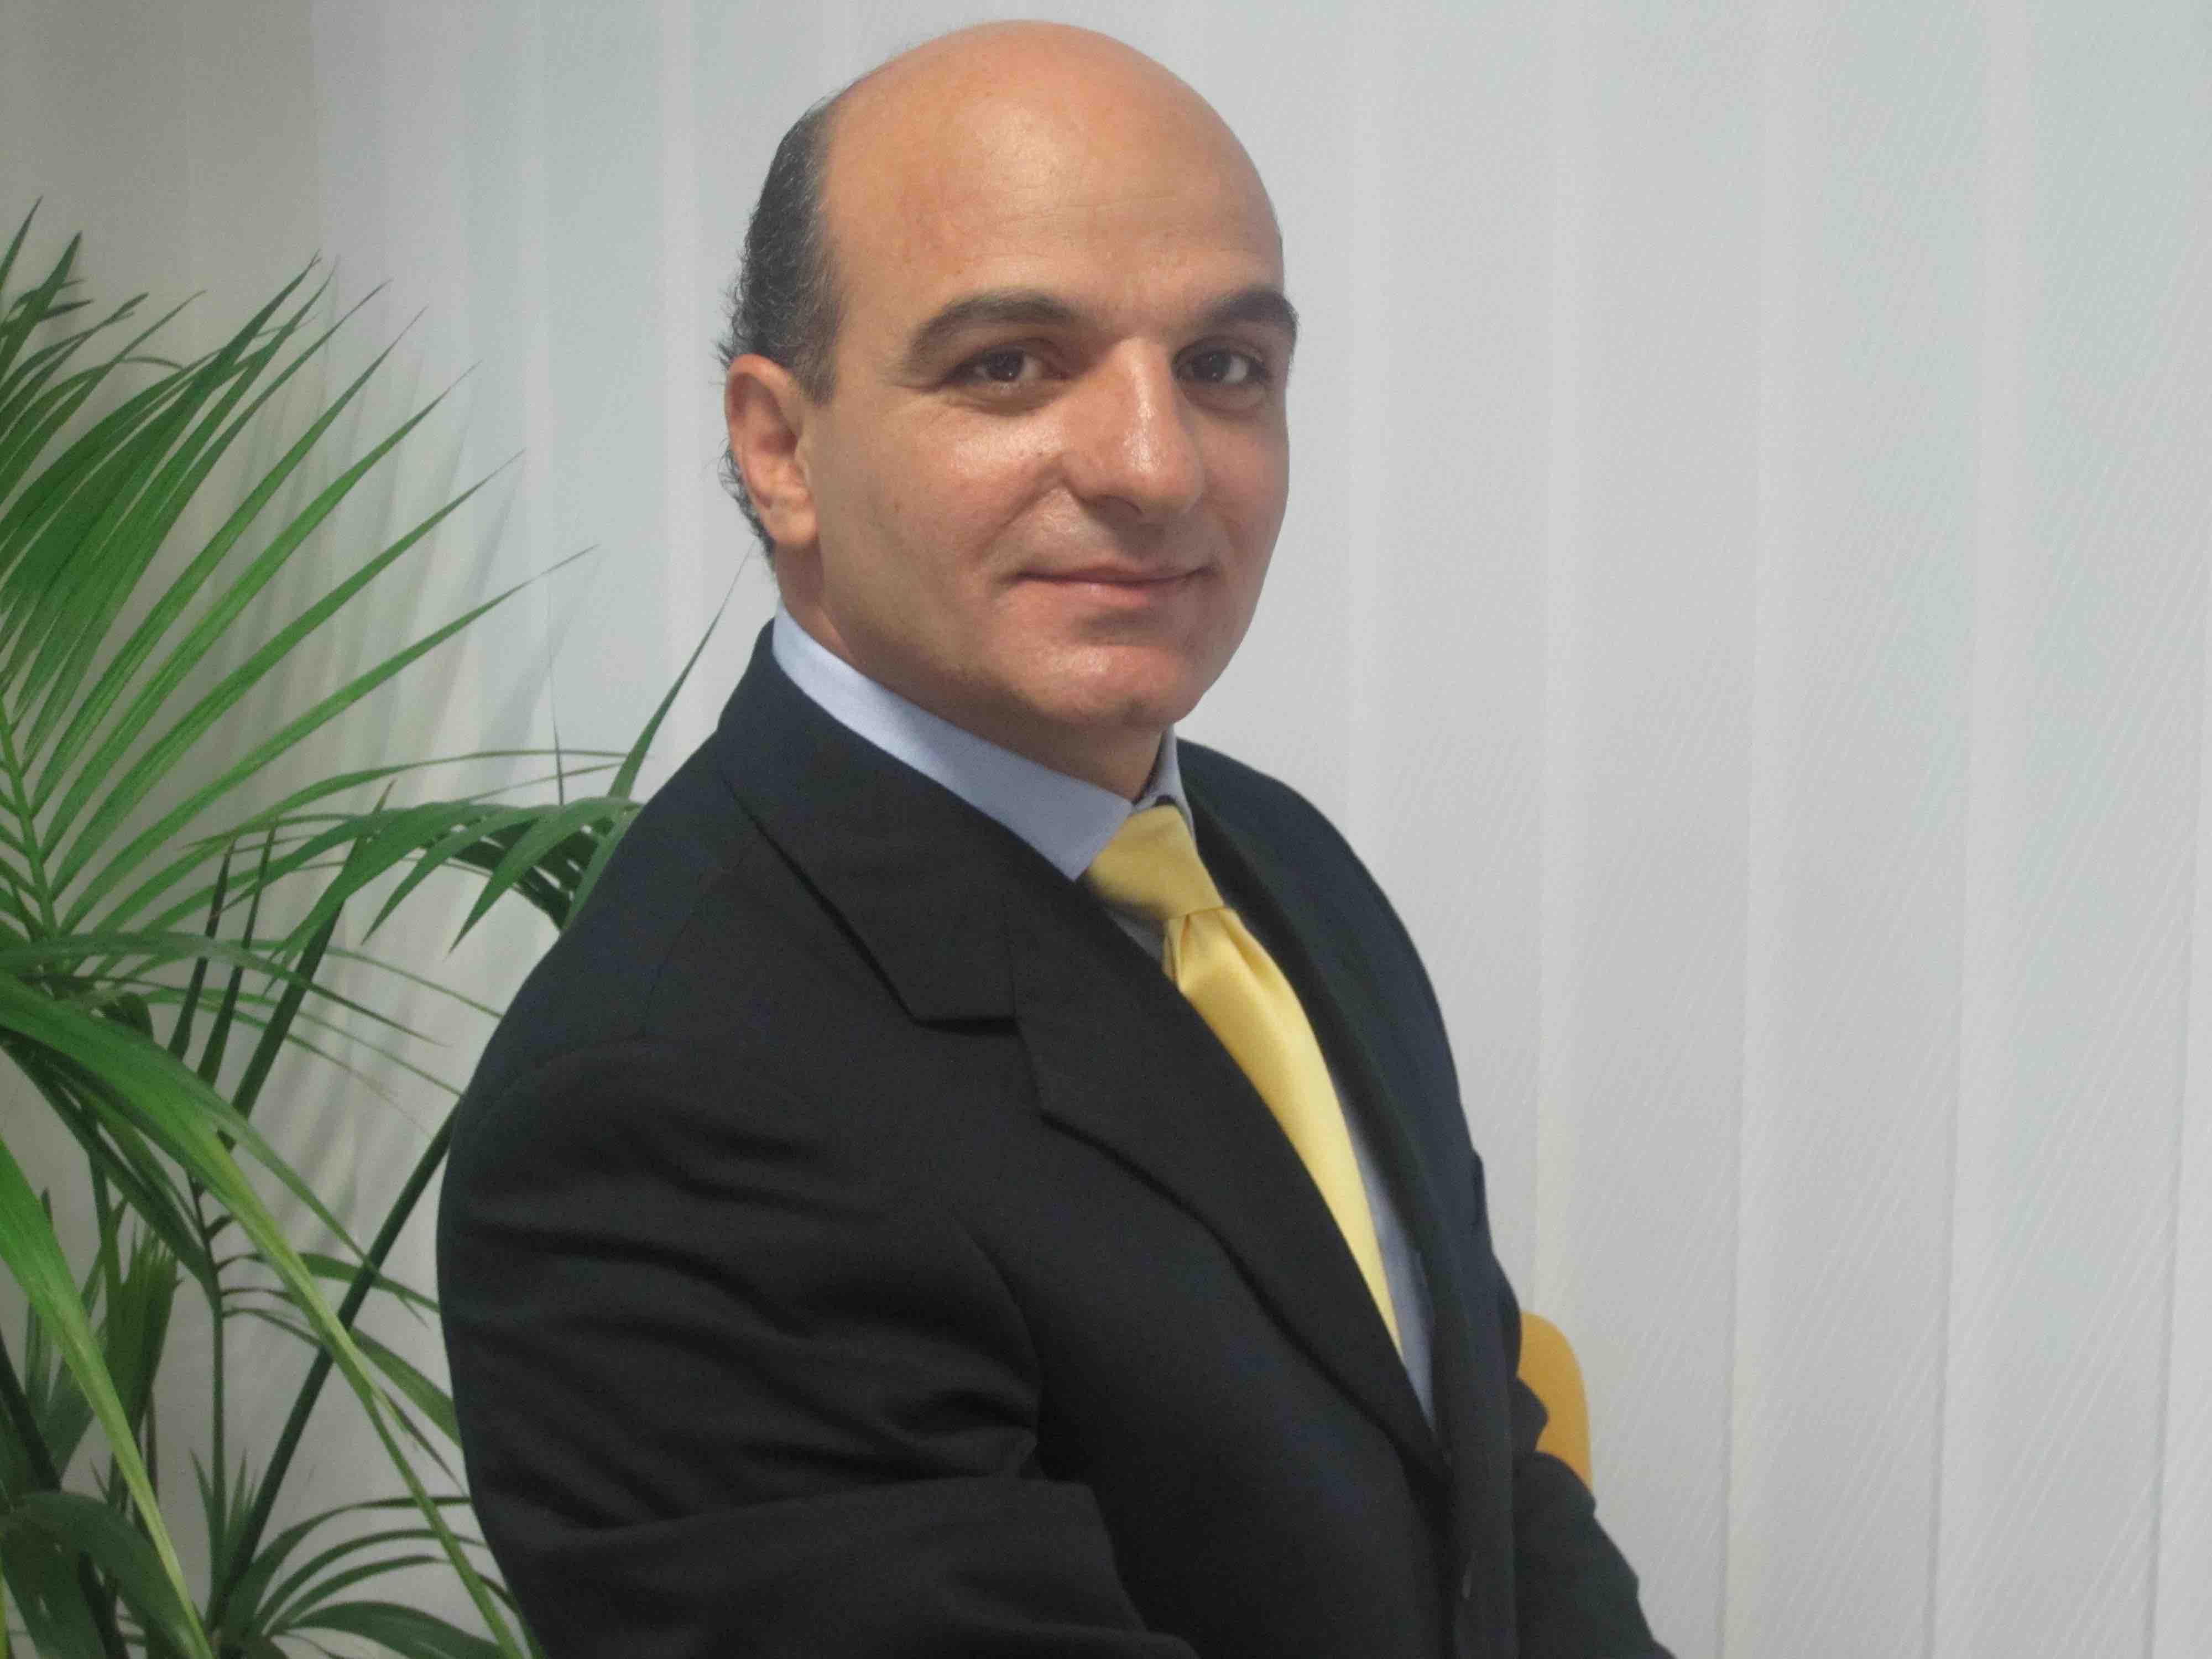 Hatem Sleiman, Regional Vice President Middle East at Western Union